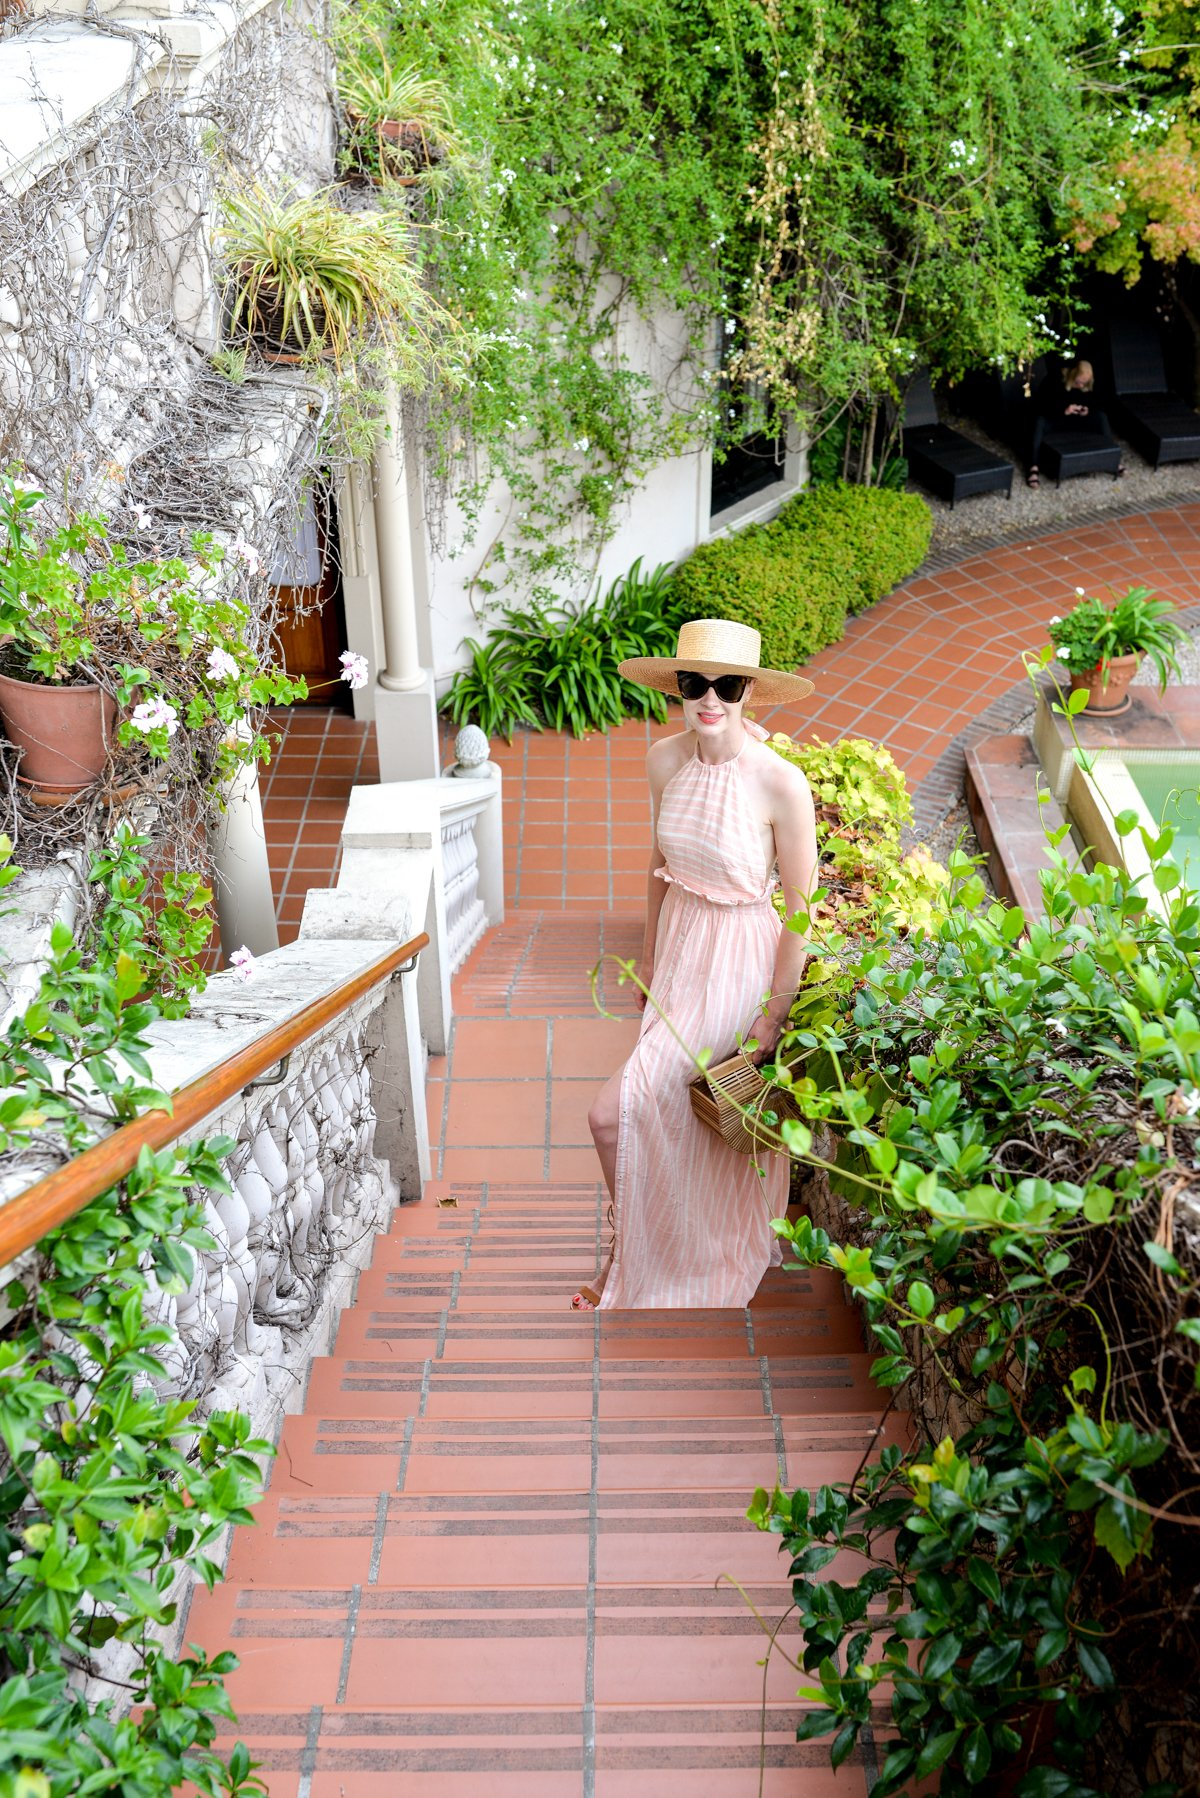 Stacie-Flinner-San-Isidro-Hotel-Del-Casco-22